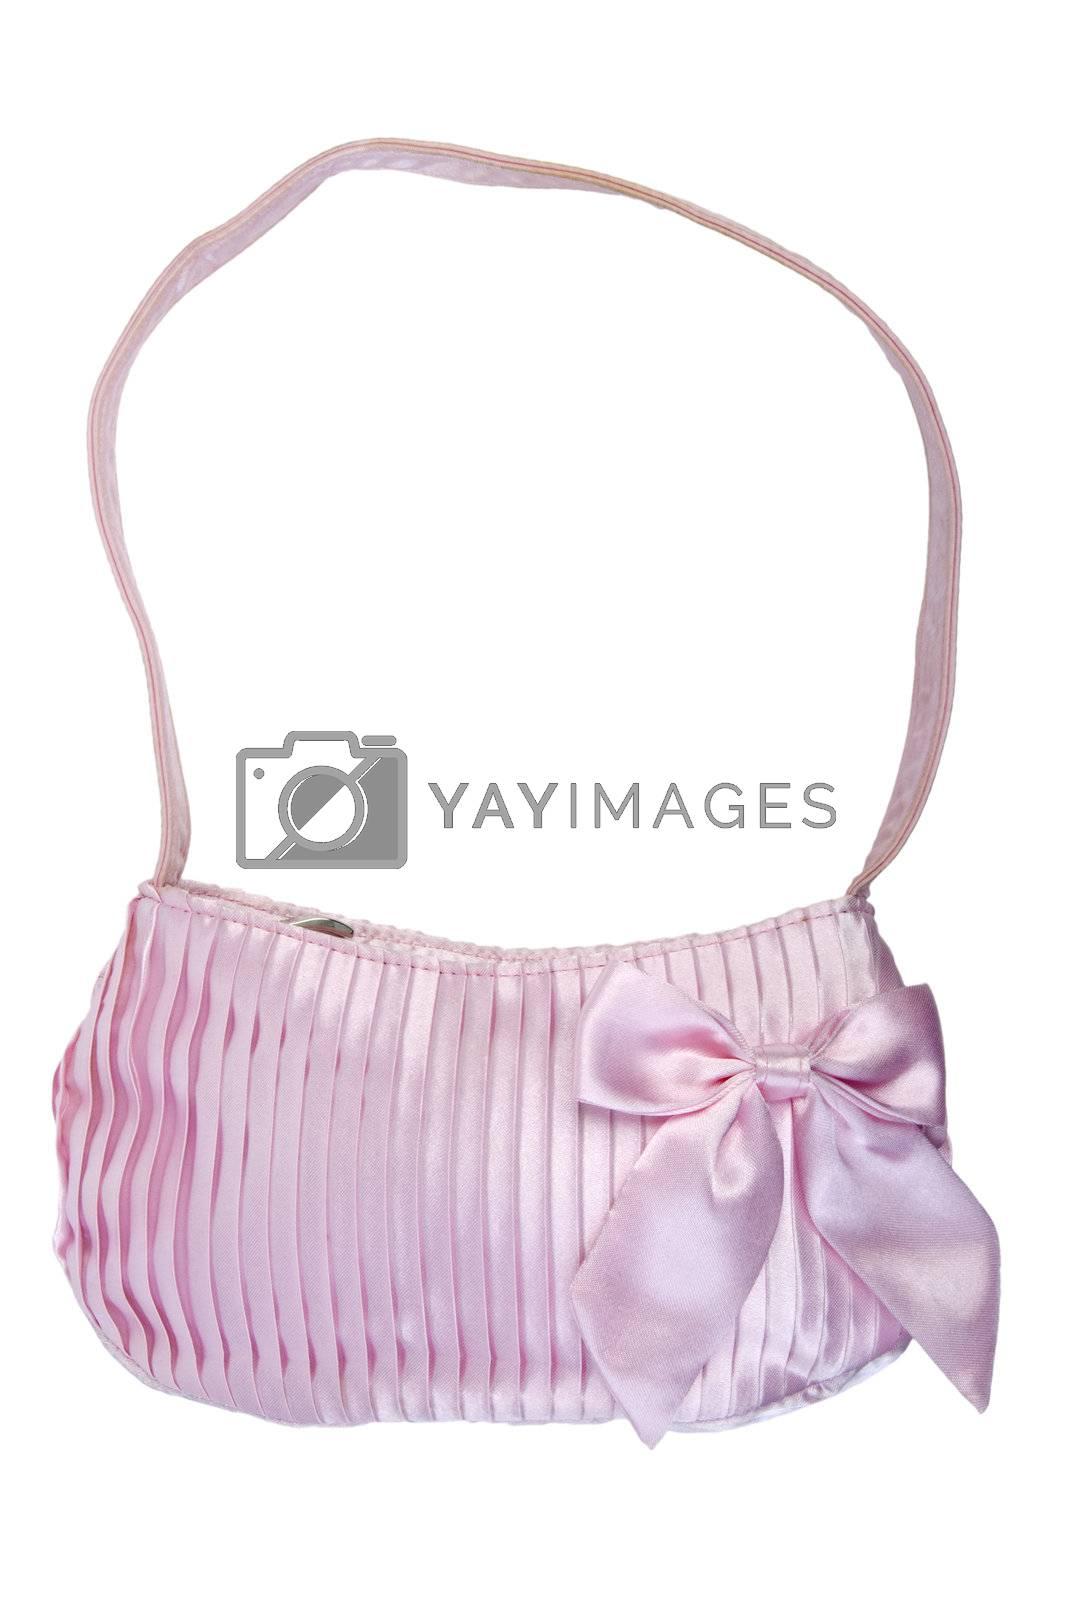 Royalty free image of Pink handbag   Isolated by zakaz